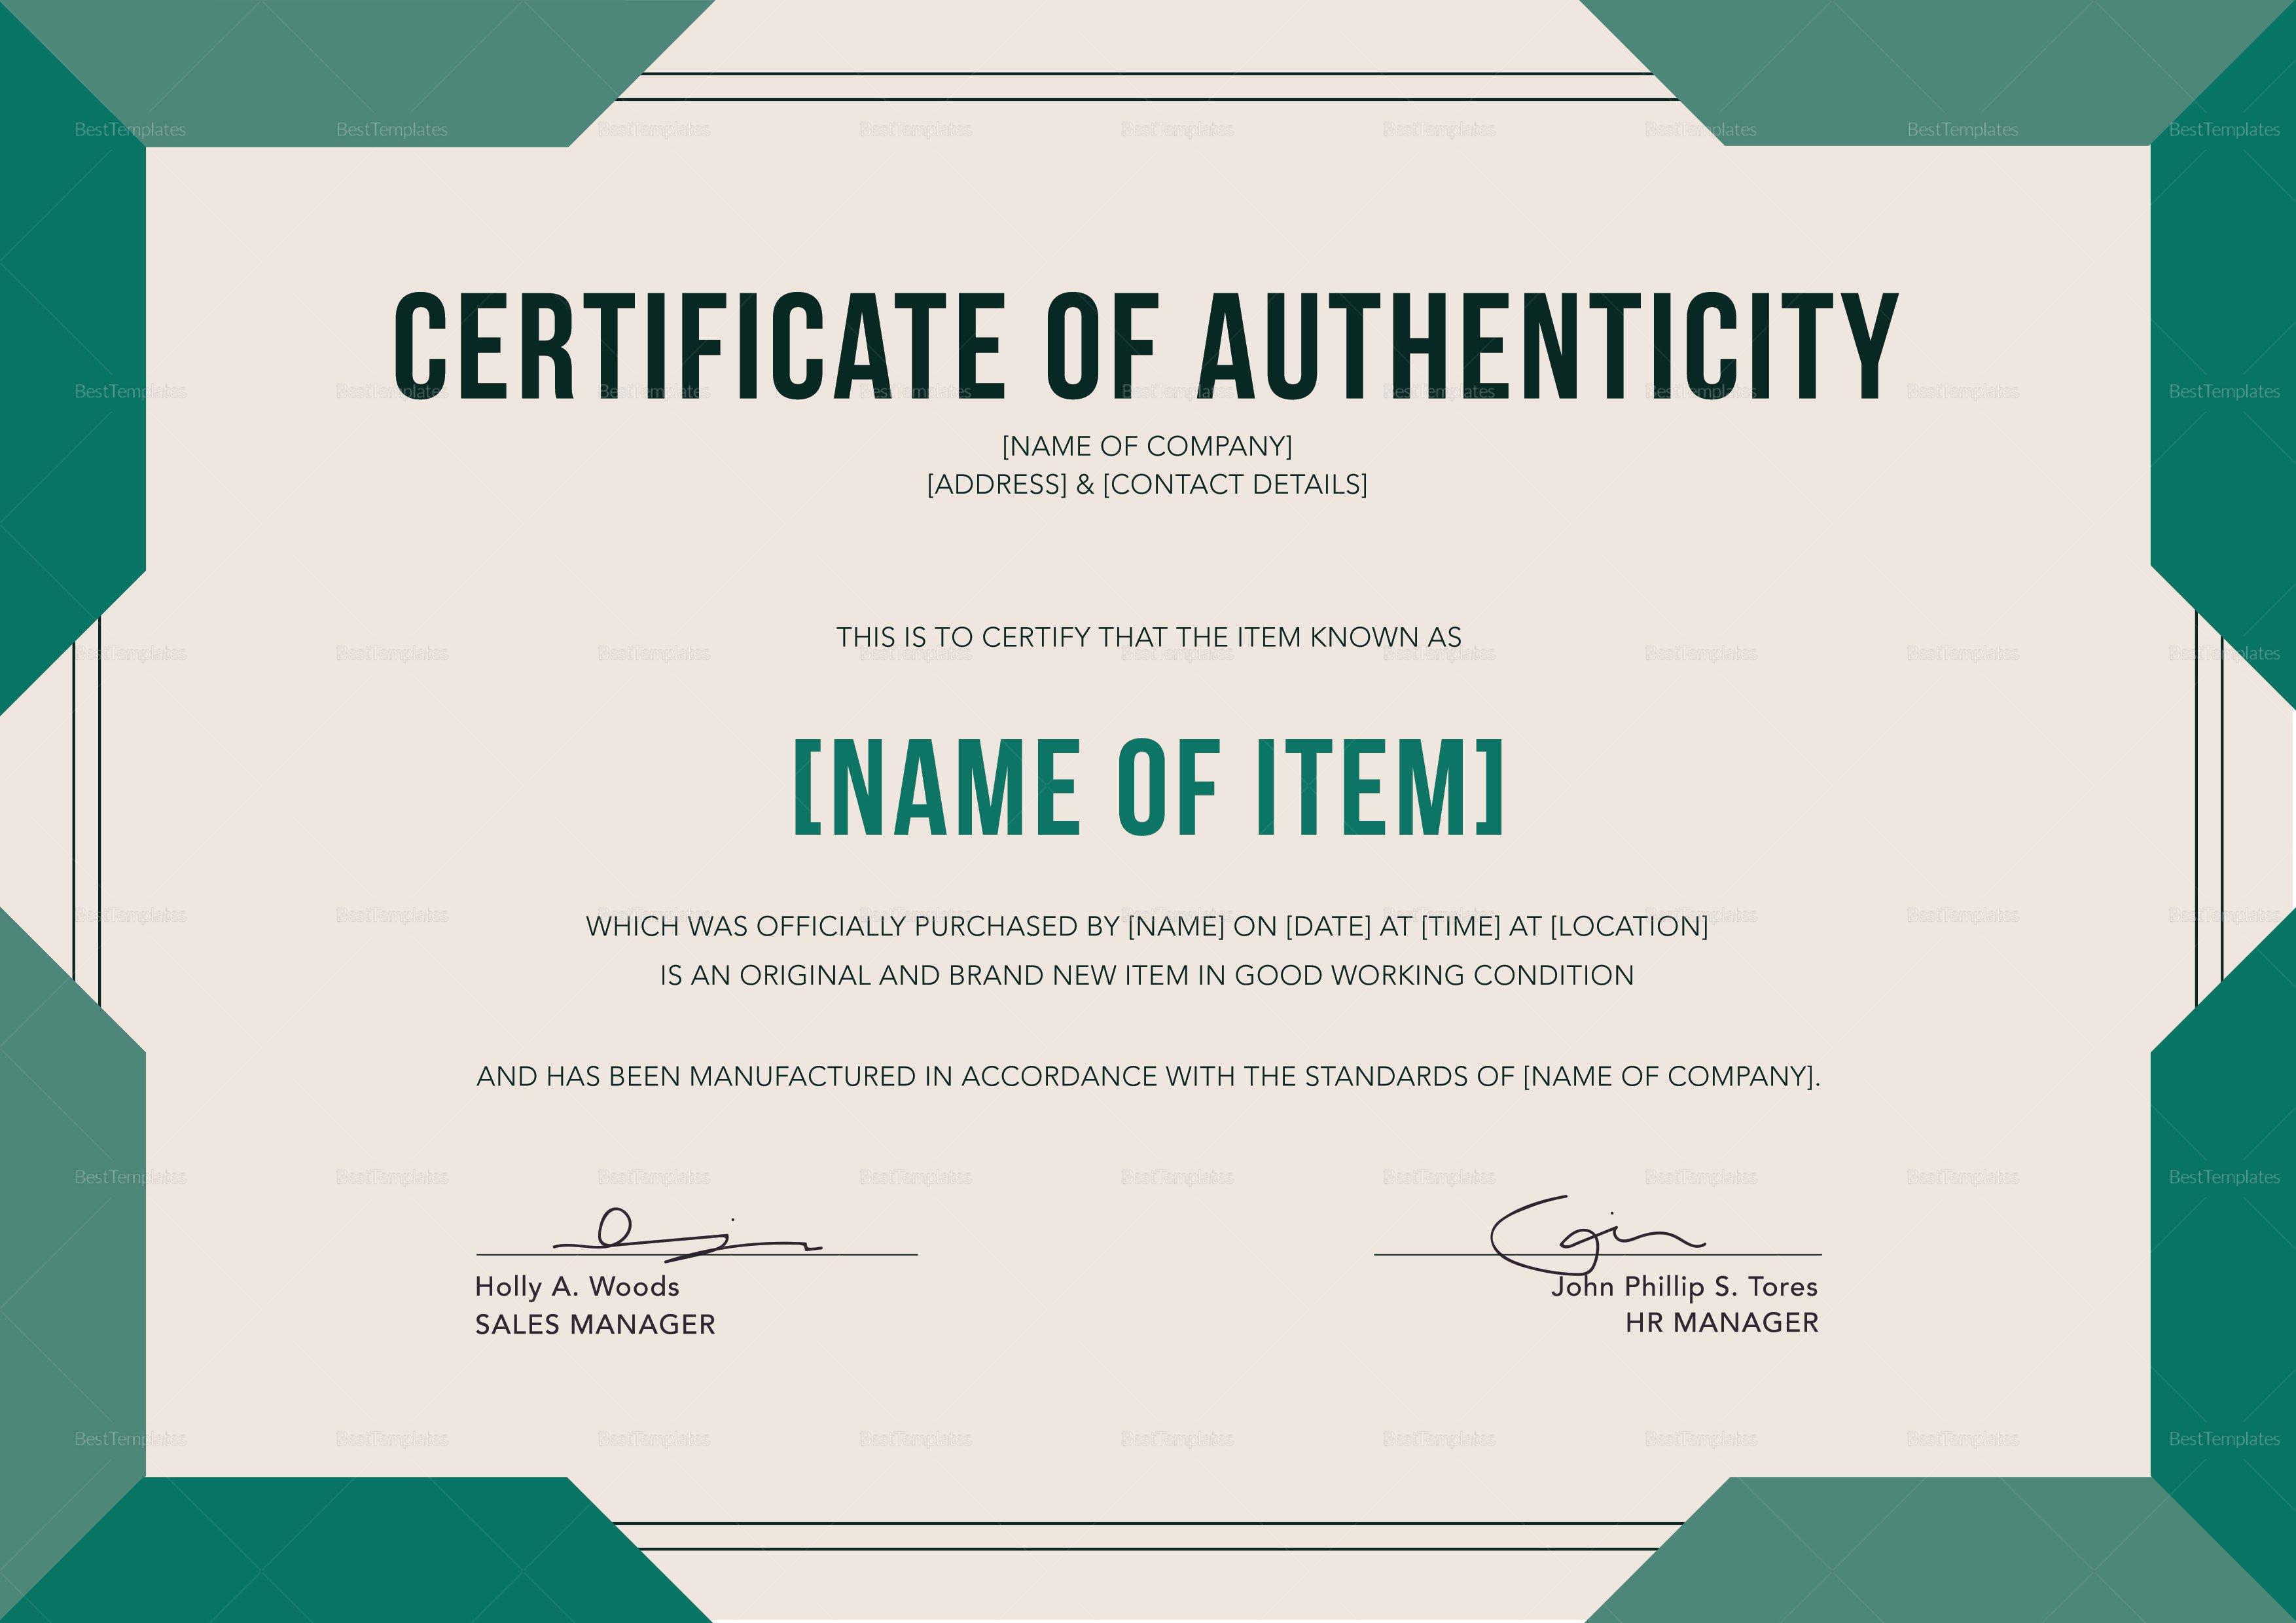 Certificate Of Authenticity Template Elegant Certificate Of Authenticity Design Template In Psd